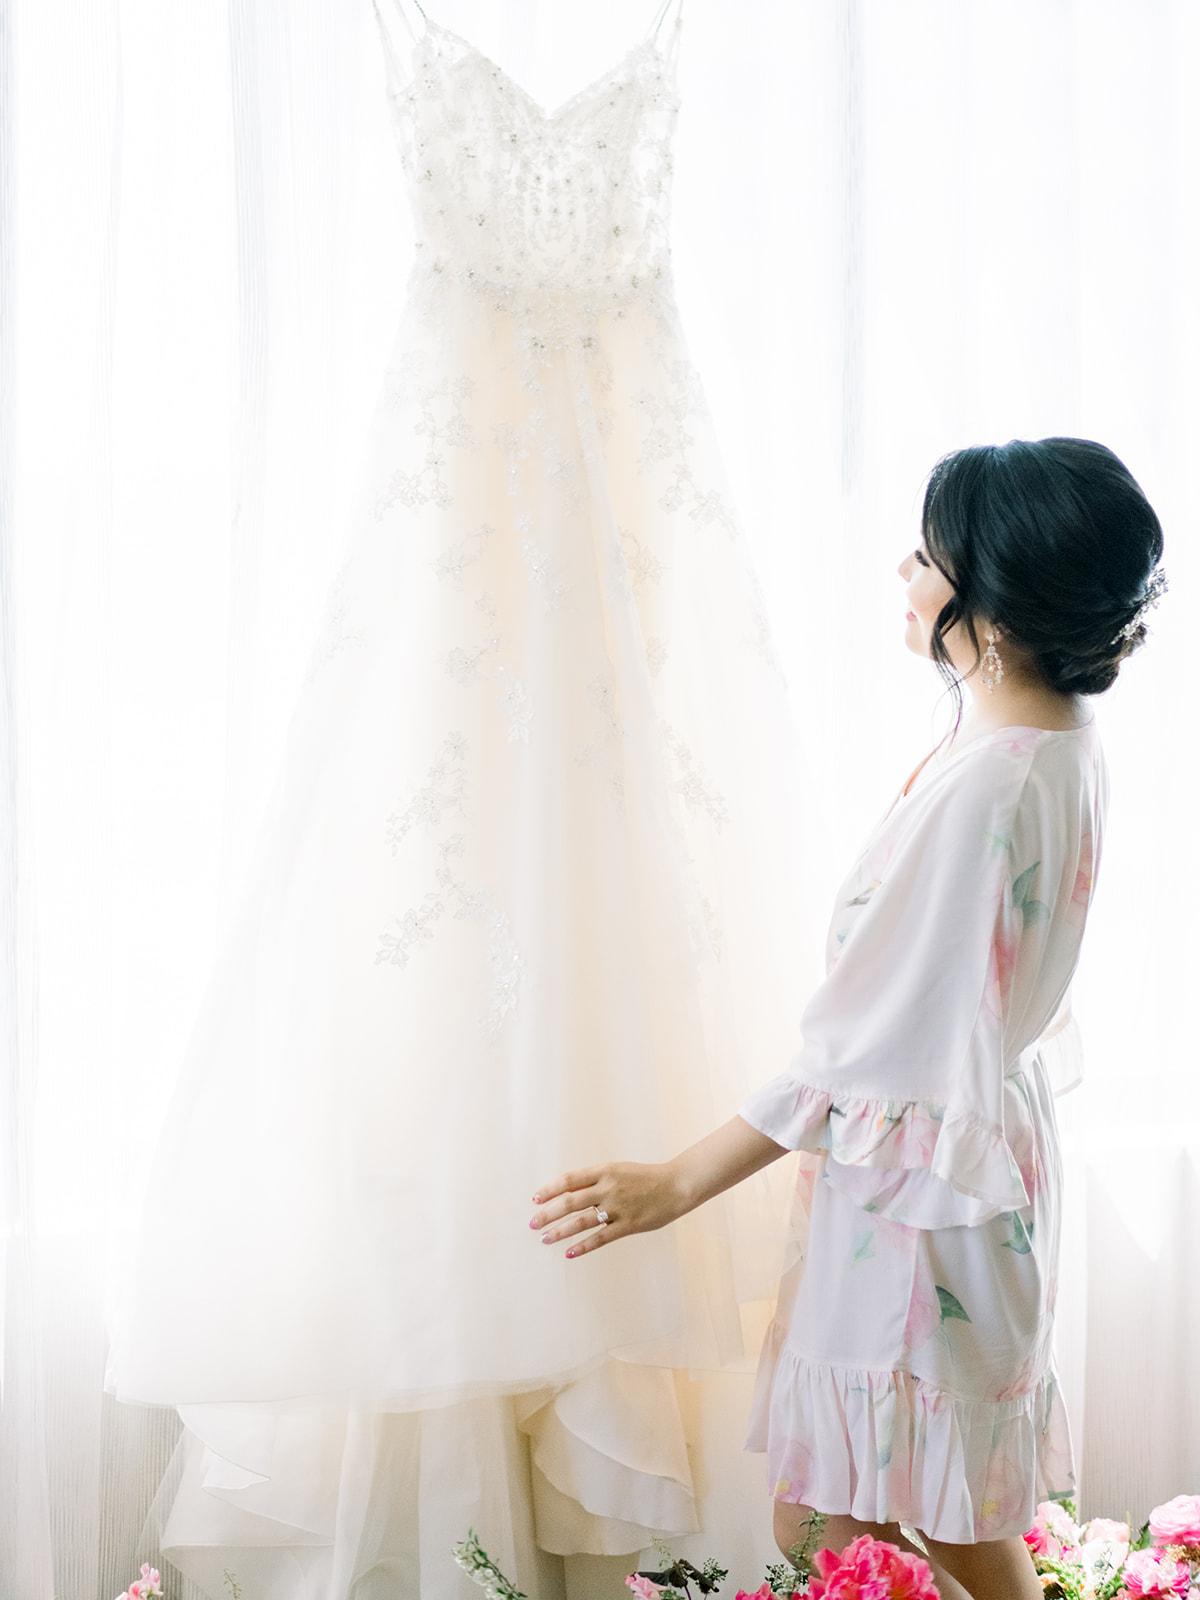 jueunandjon-etherandsmith-wedding-169.jpg